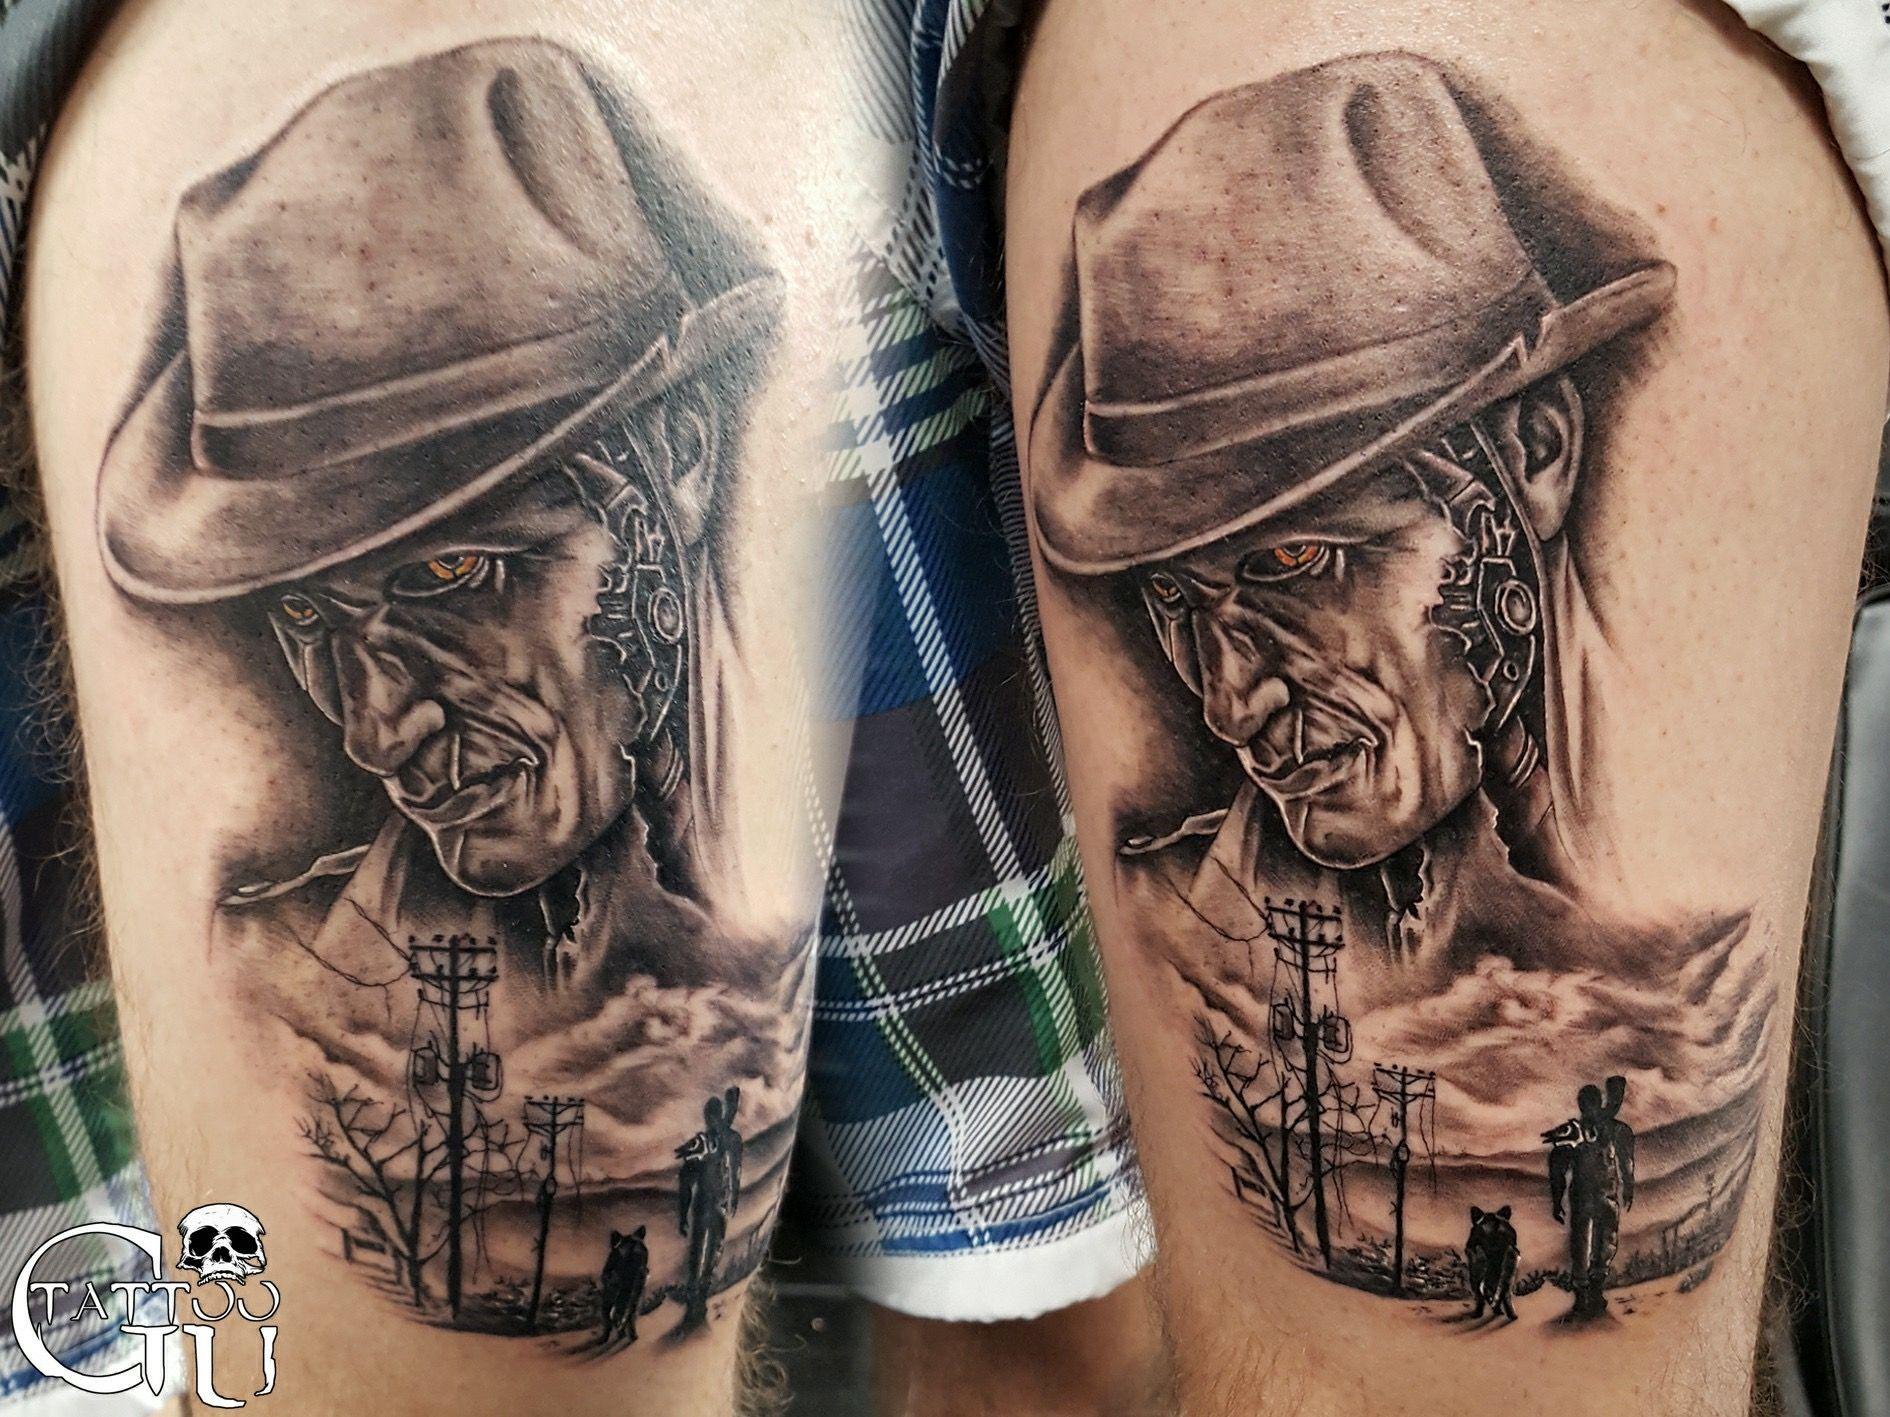 Fallout 4 Tattoo Gavin Underhill Tattoos Fallout 4